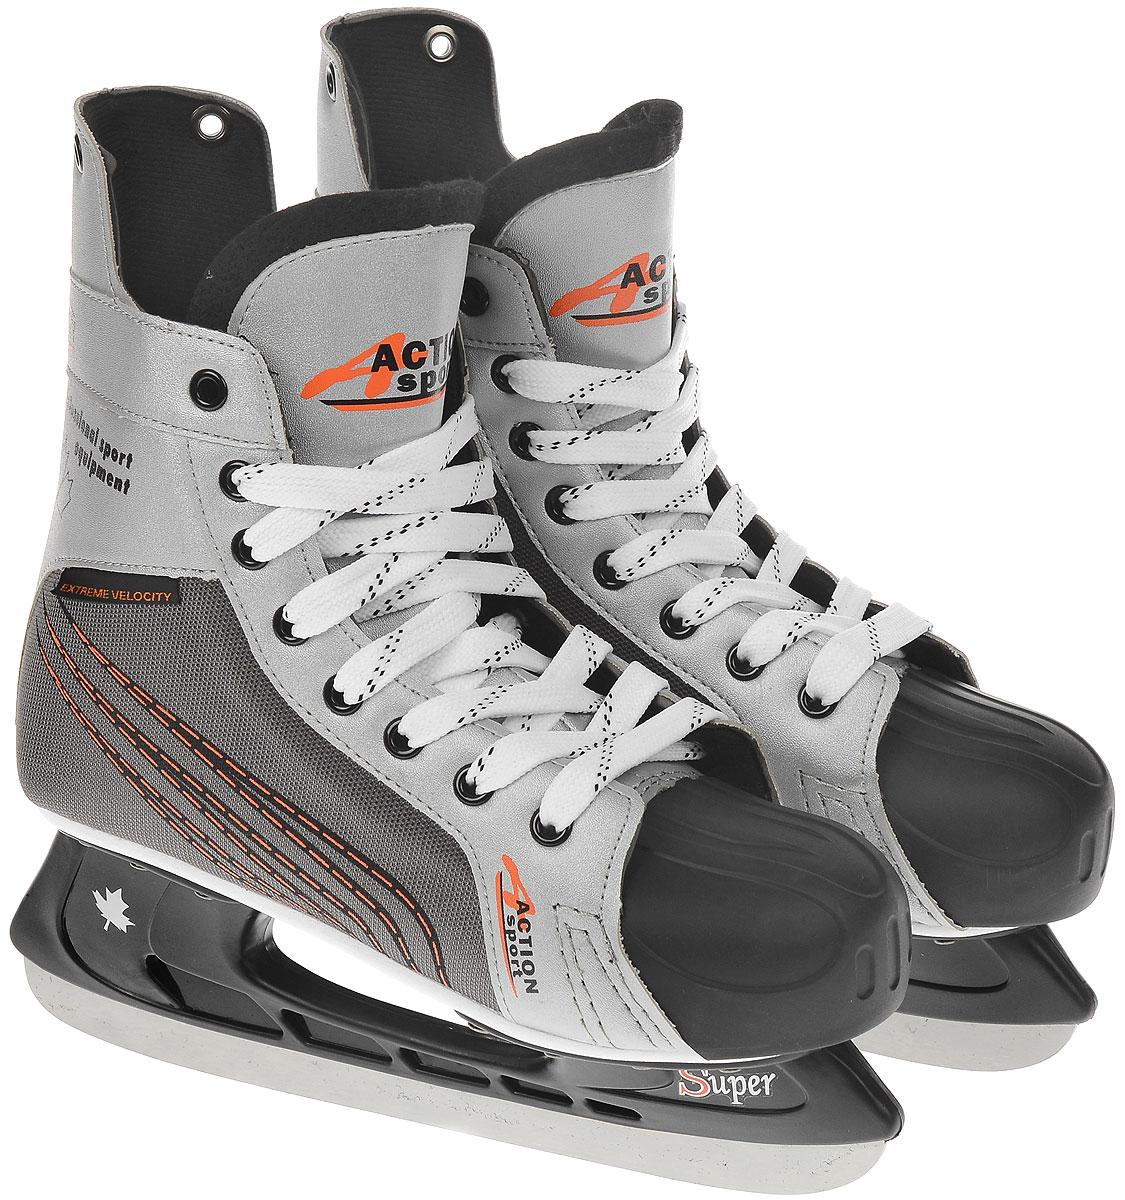 Коньки хоккейные мужские Action, цвет: белый, серый. PW-216N. Размер 45